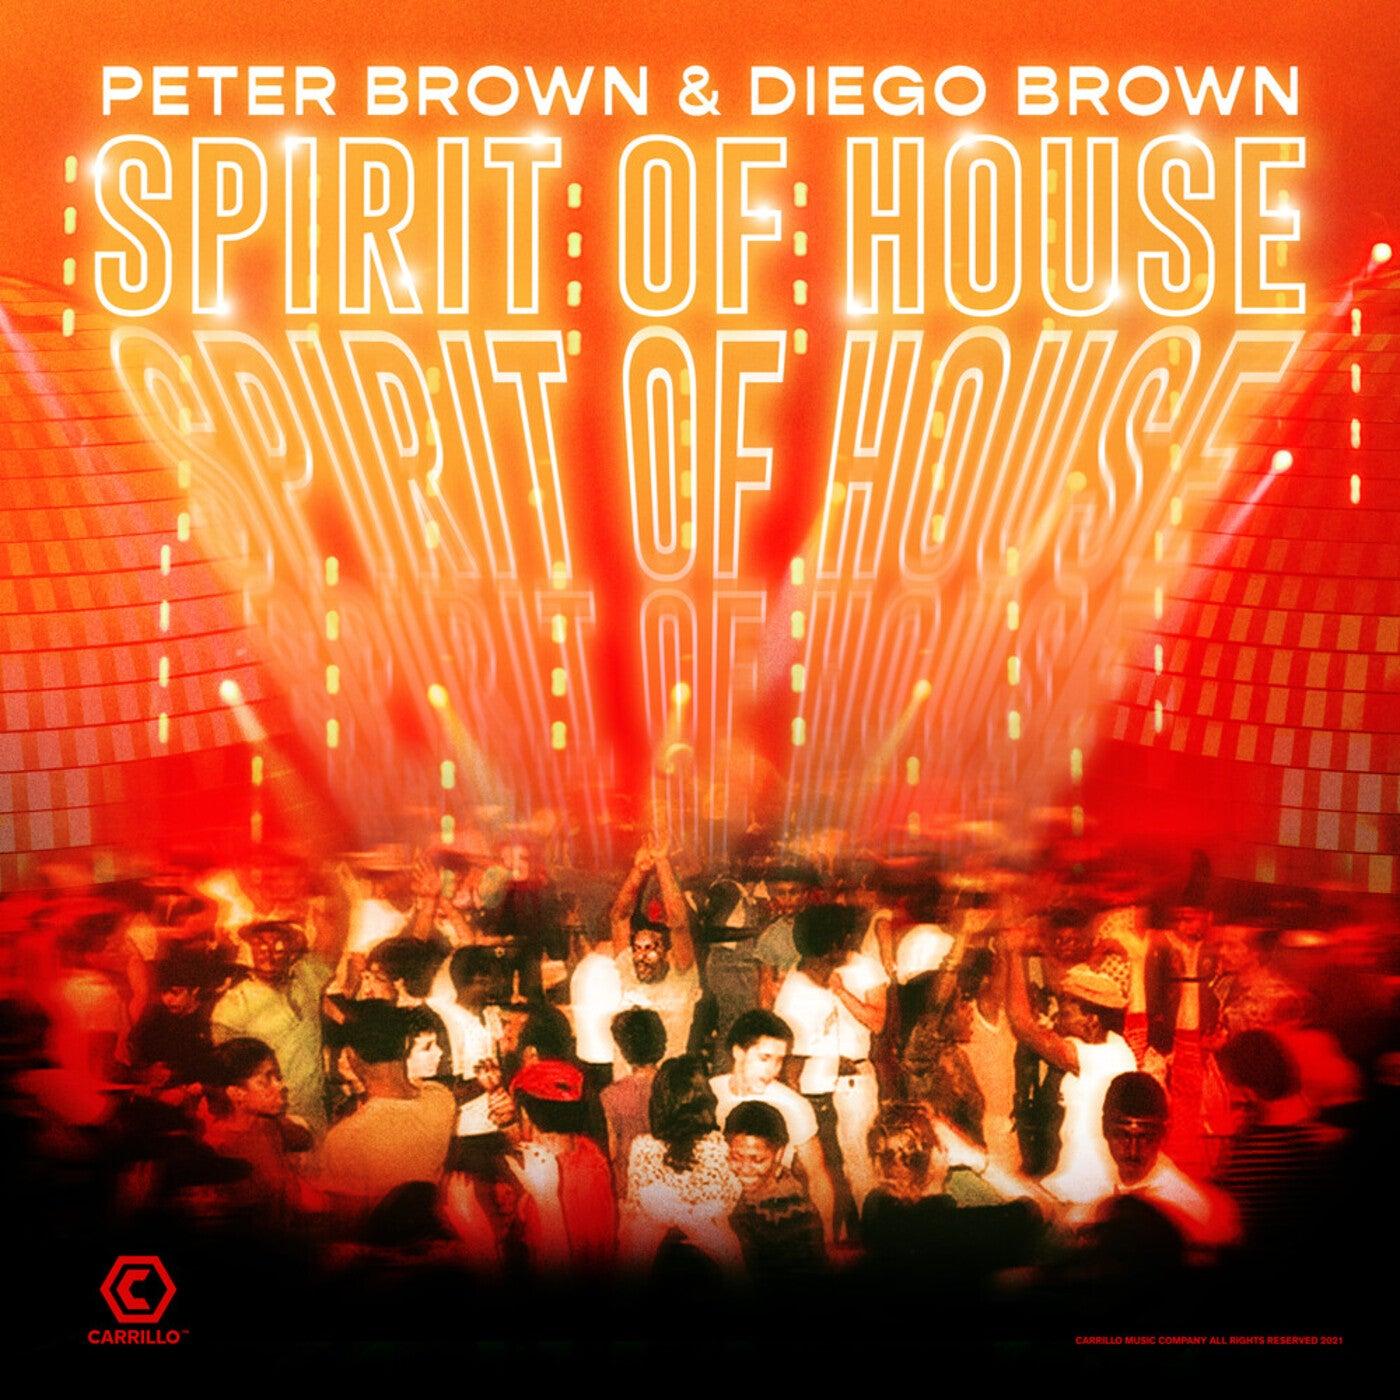 Spirit of House (Club Mix)